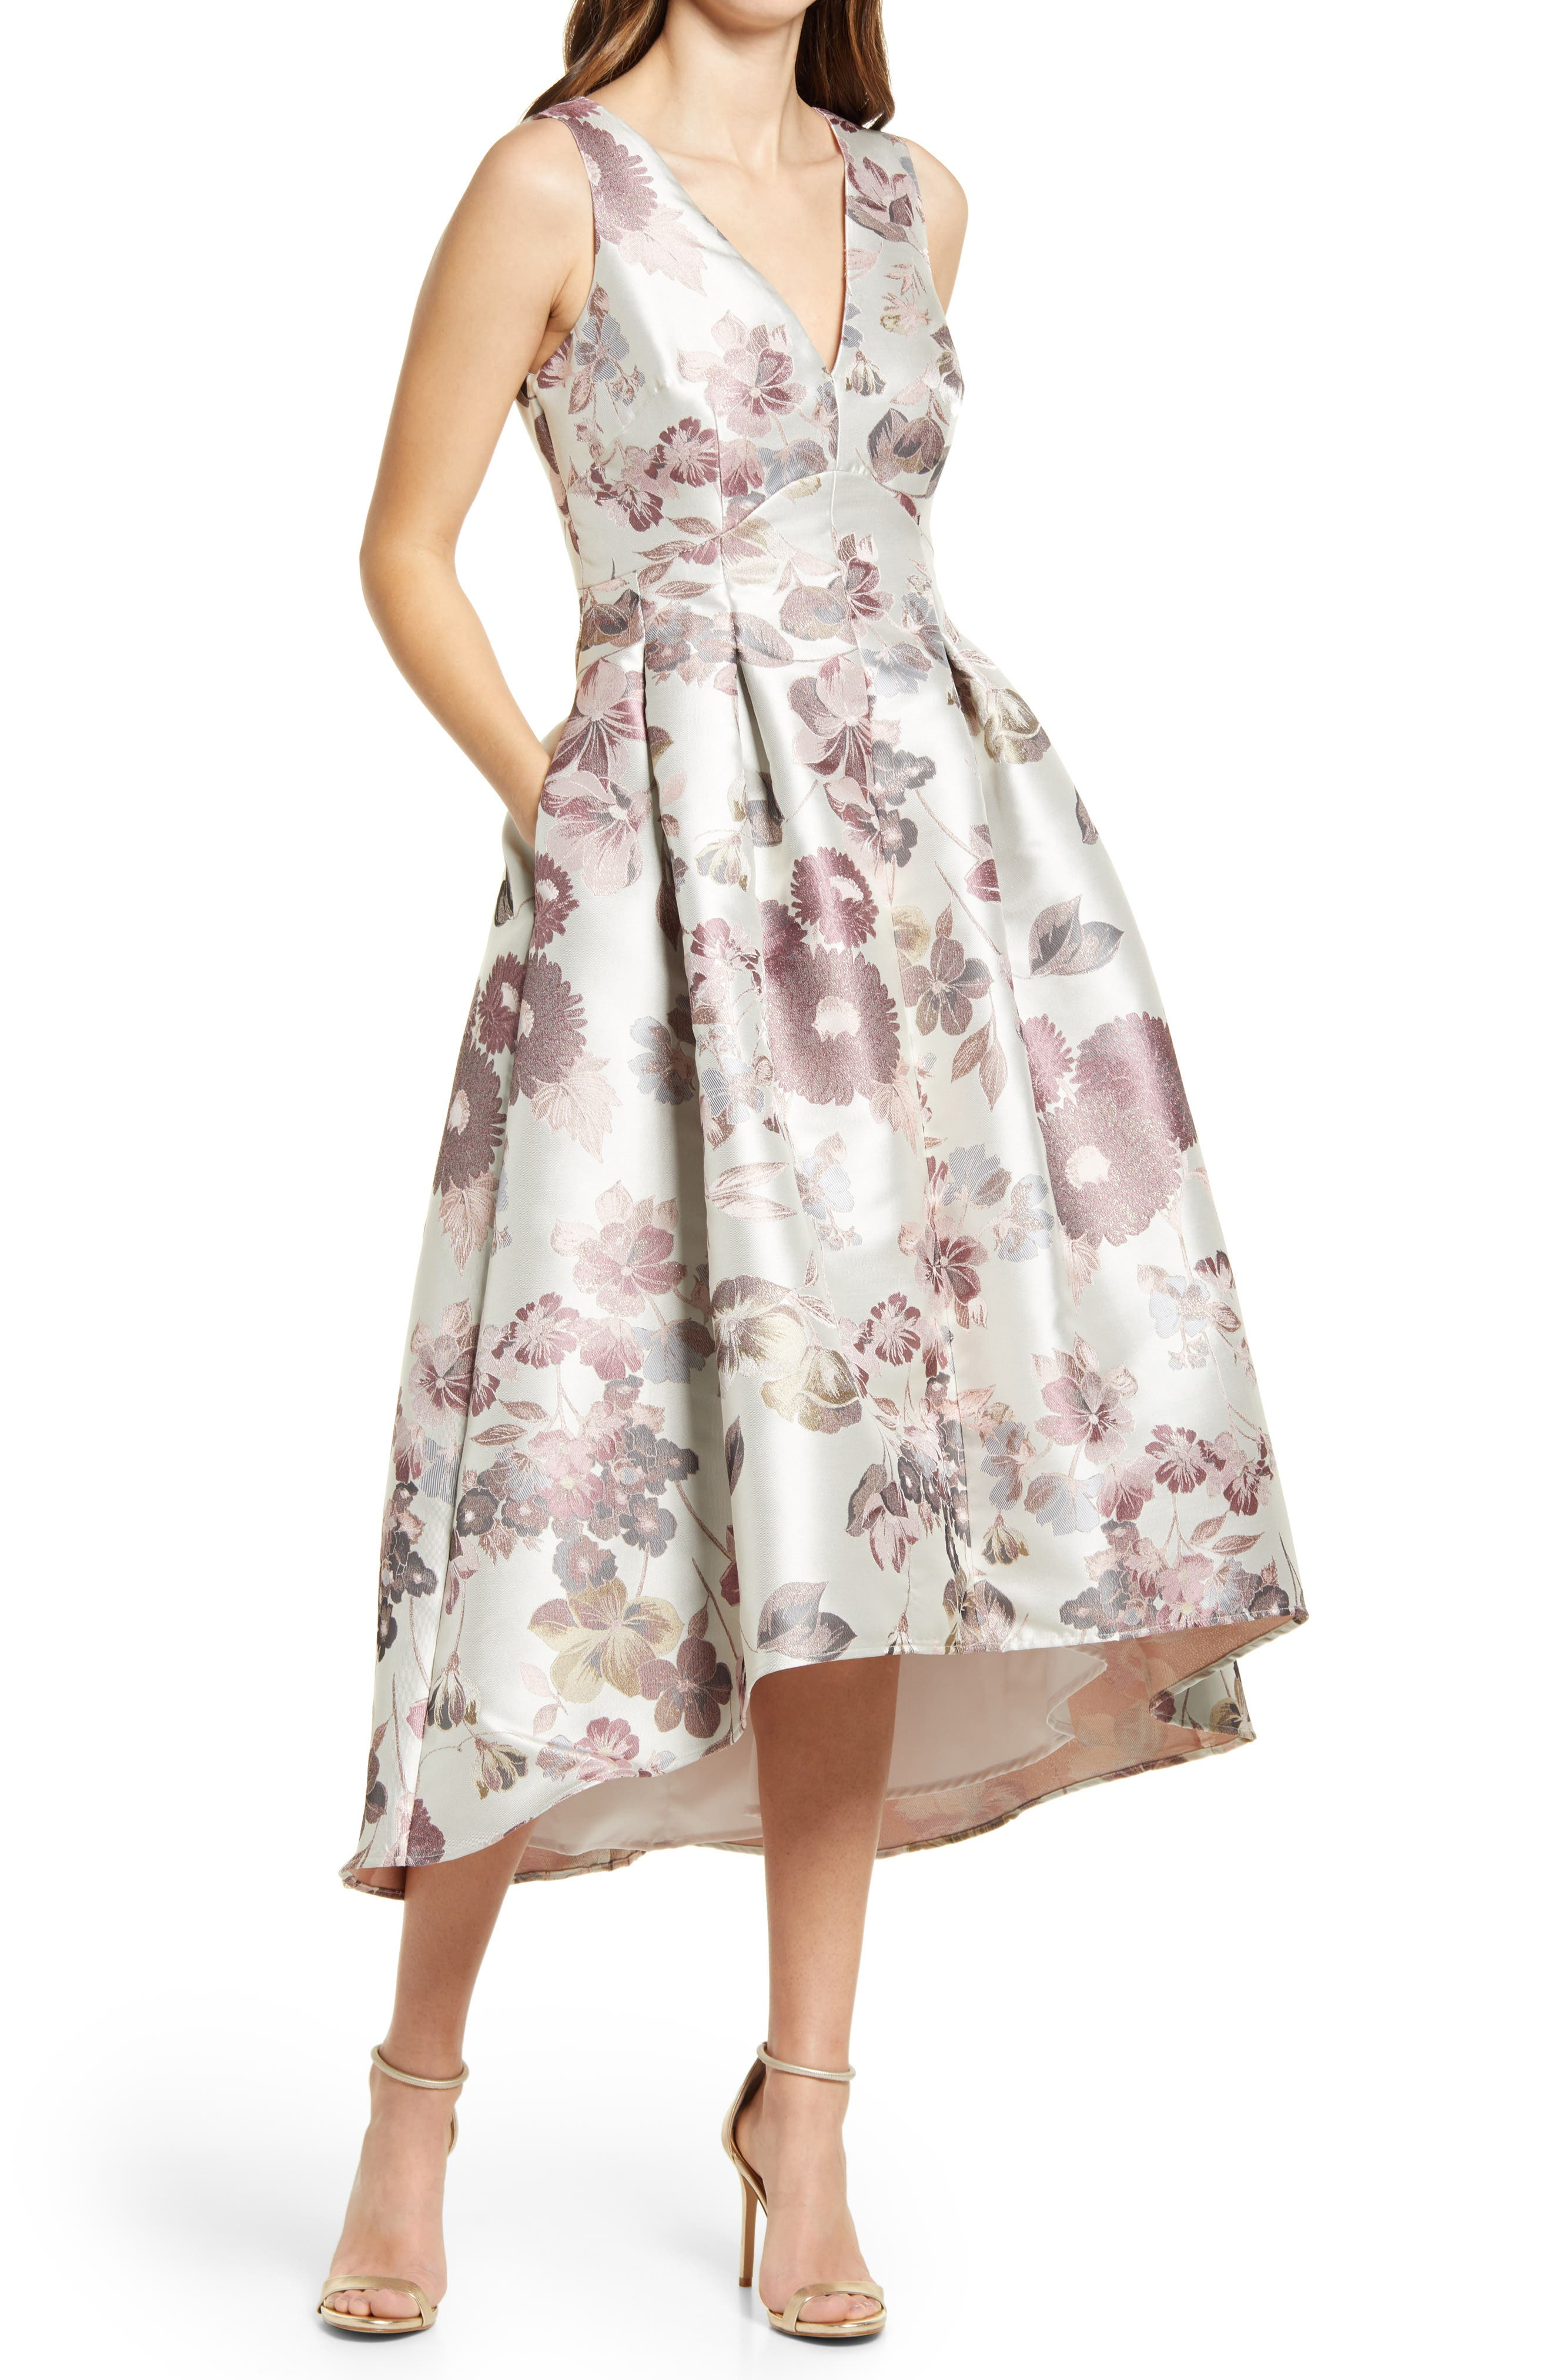 Metallic Floral Jacquard High/low Dress